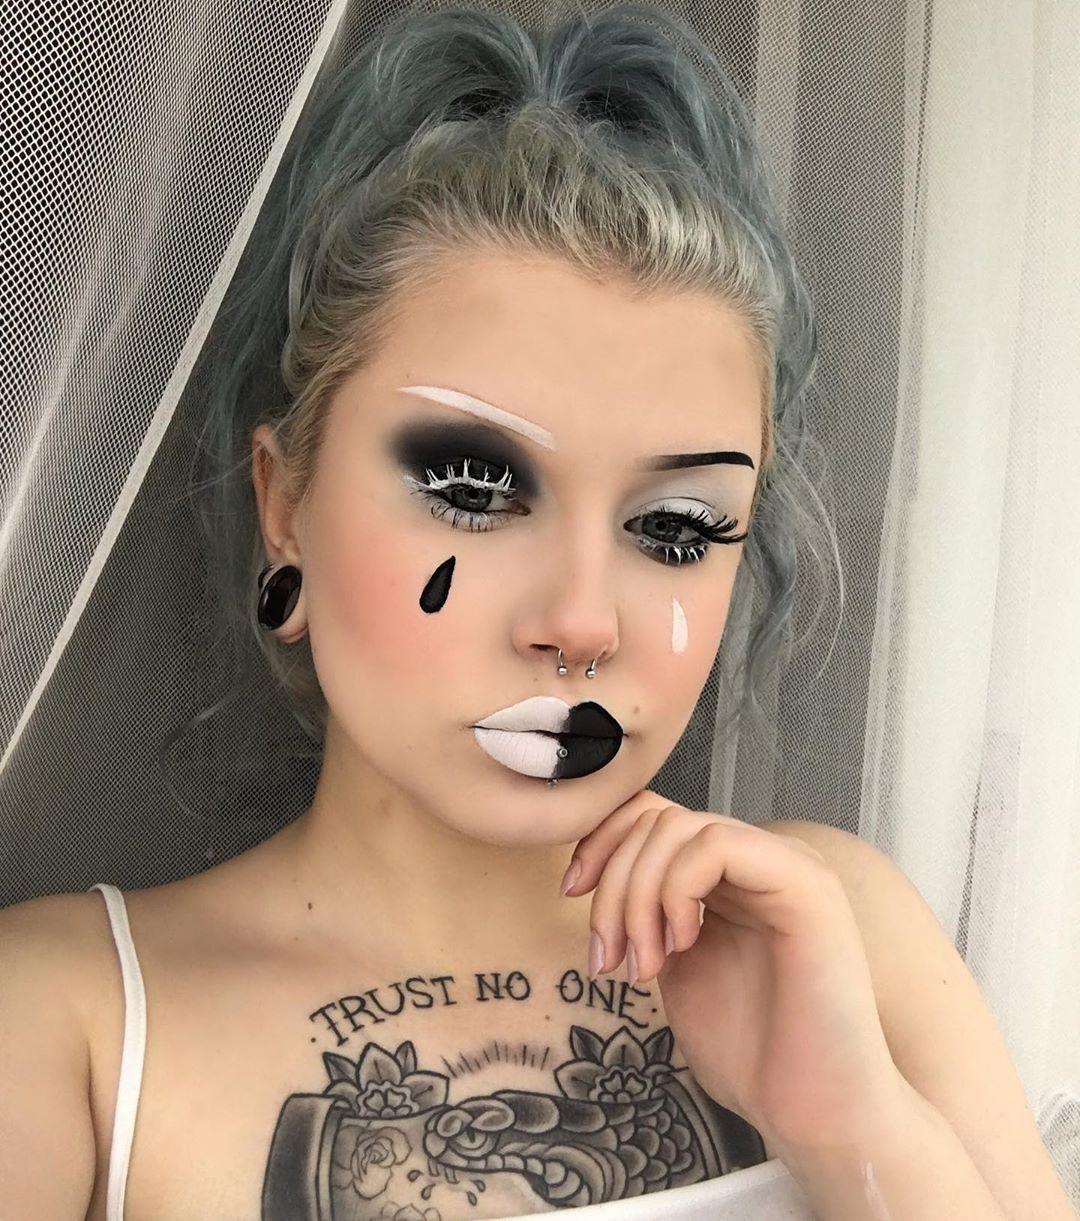 "Julka Karwat on Instagram: "". . . . .  #silverhair  #alternative #alternativegirl #makeup #piercing #septum #septumpiercing #stretchedears #tunnels #alternativefashion…"""